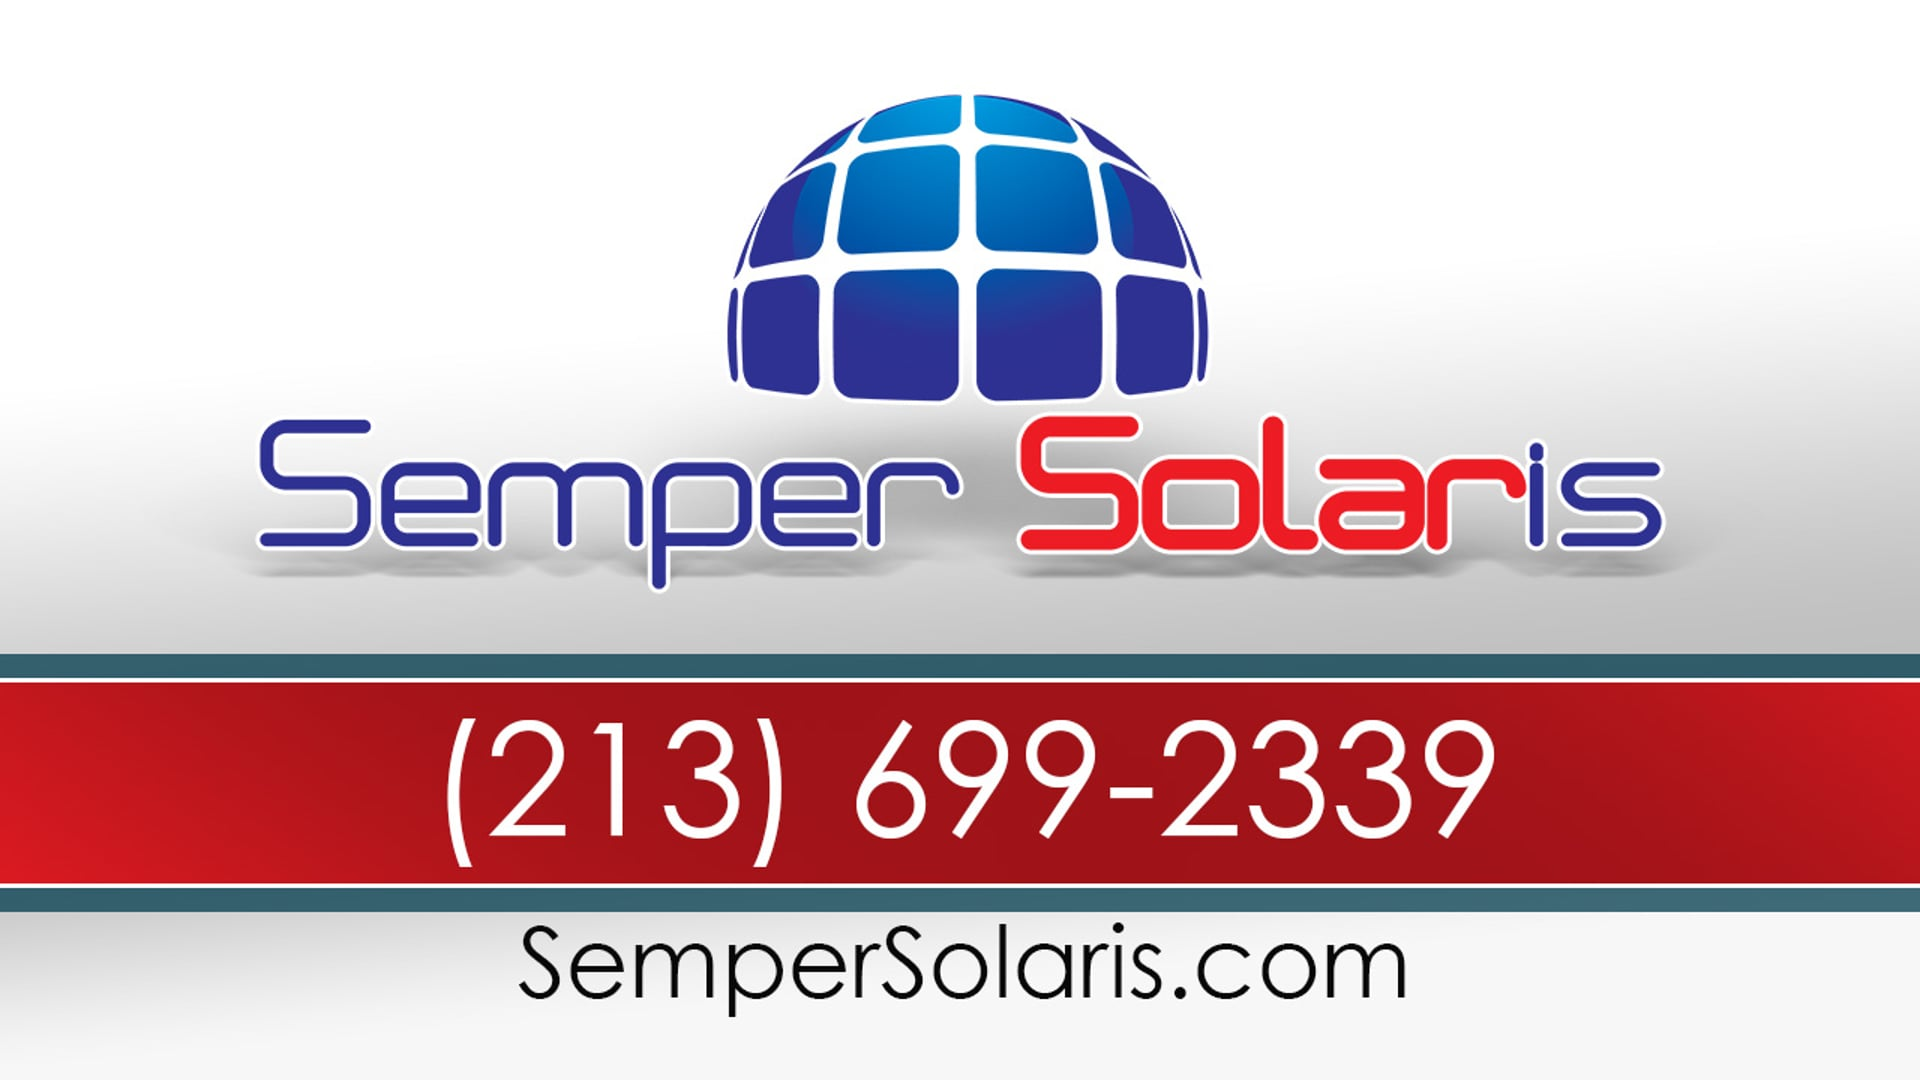 Long Beach Solar Power Companies | Semper Solaris | (213) 699-2339